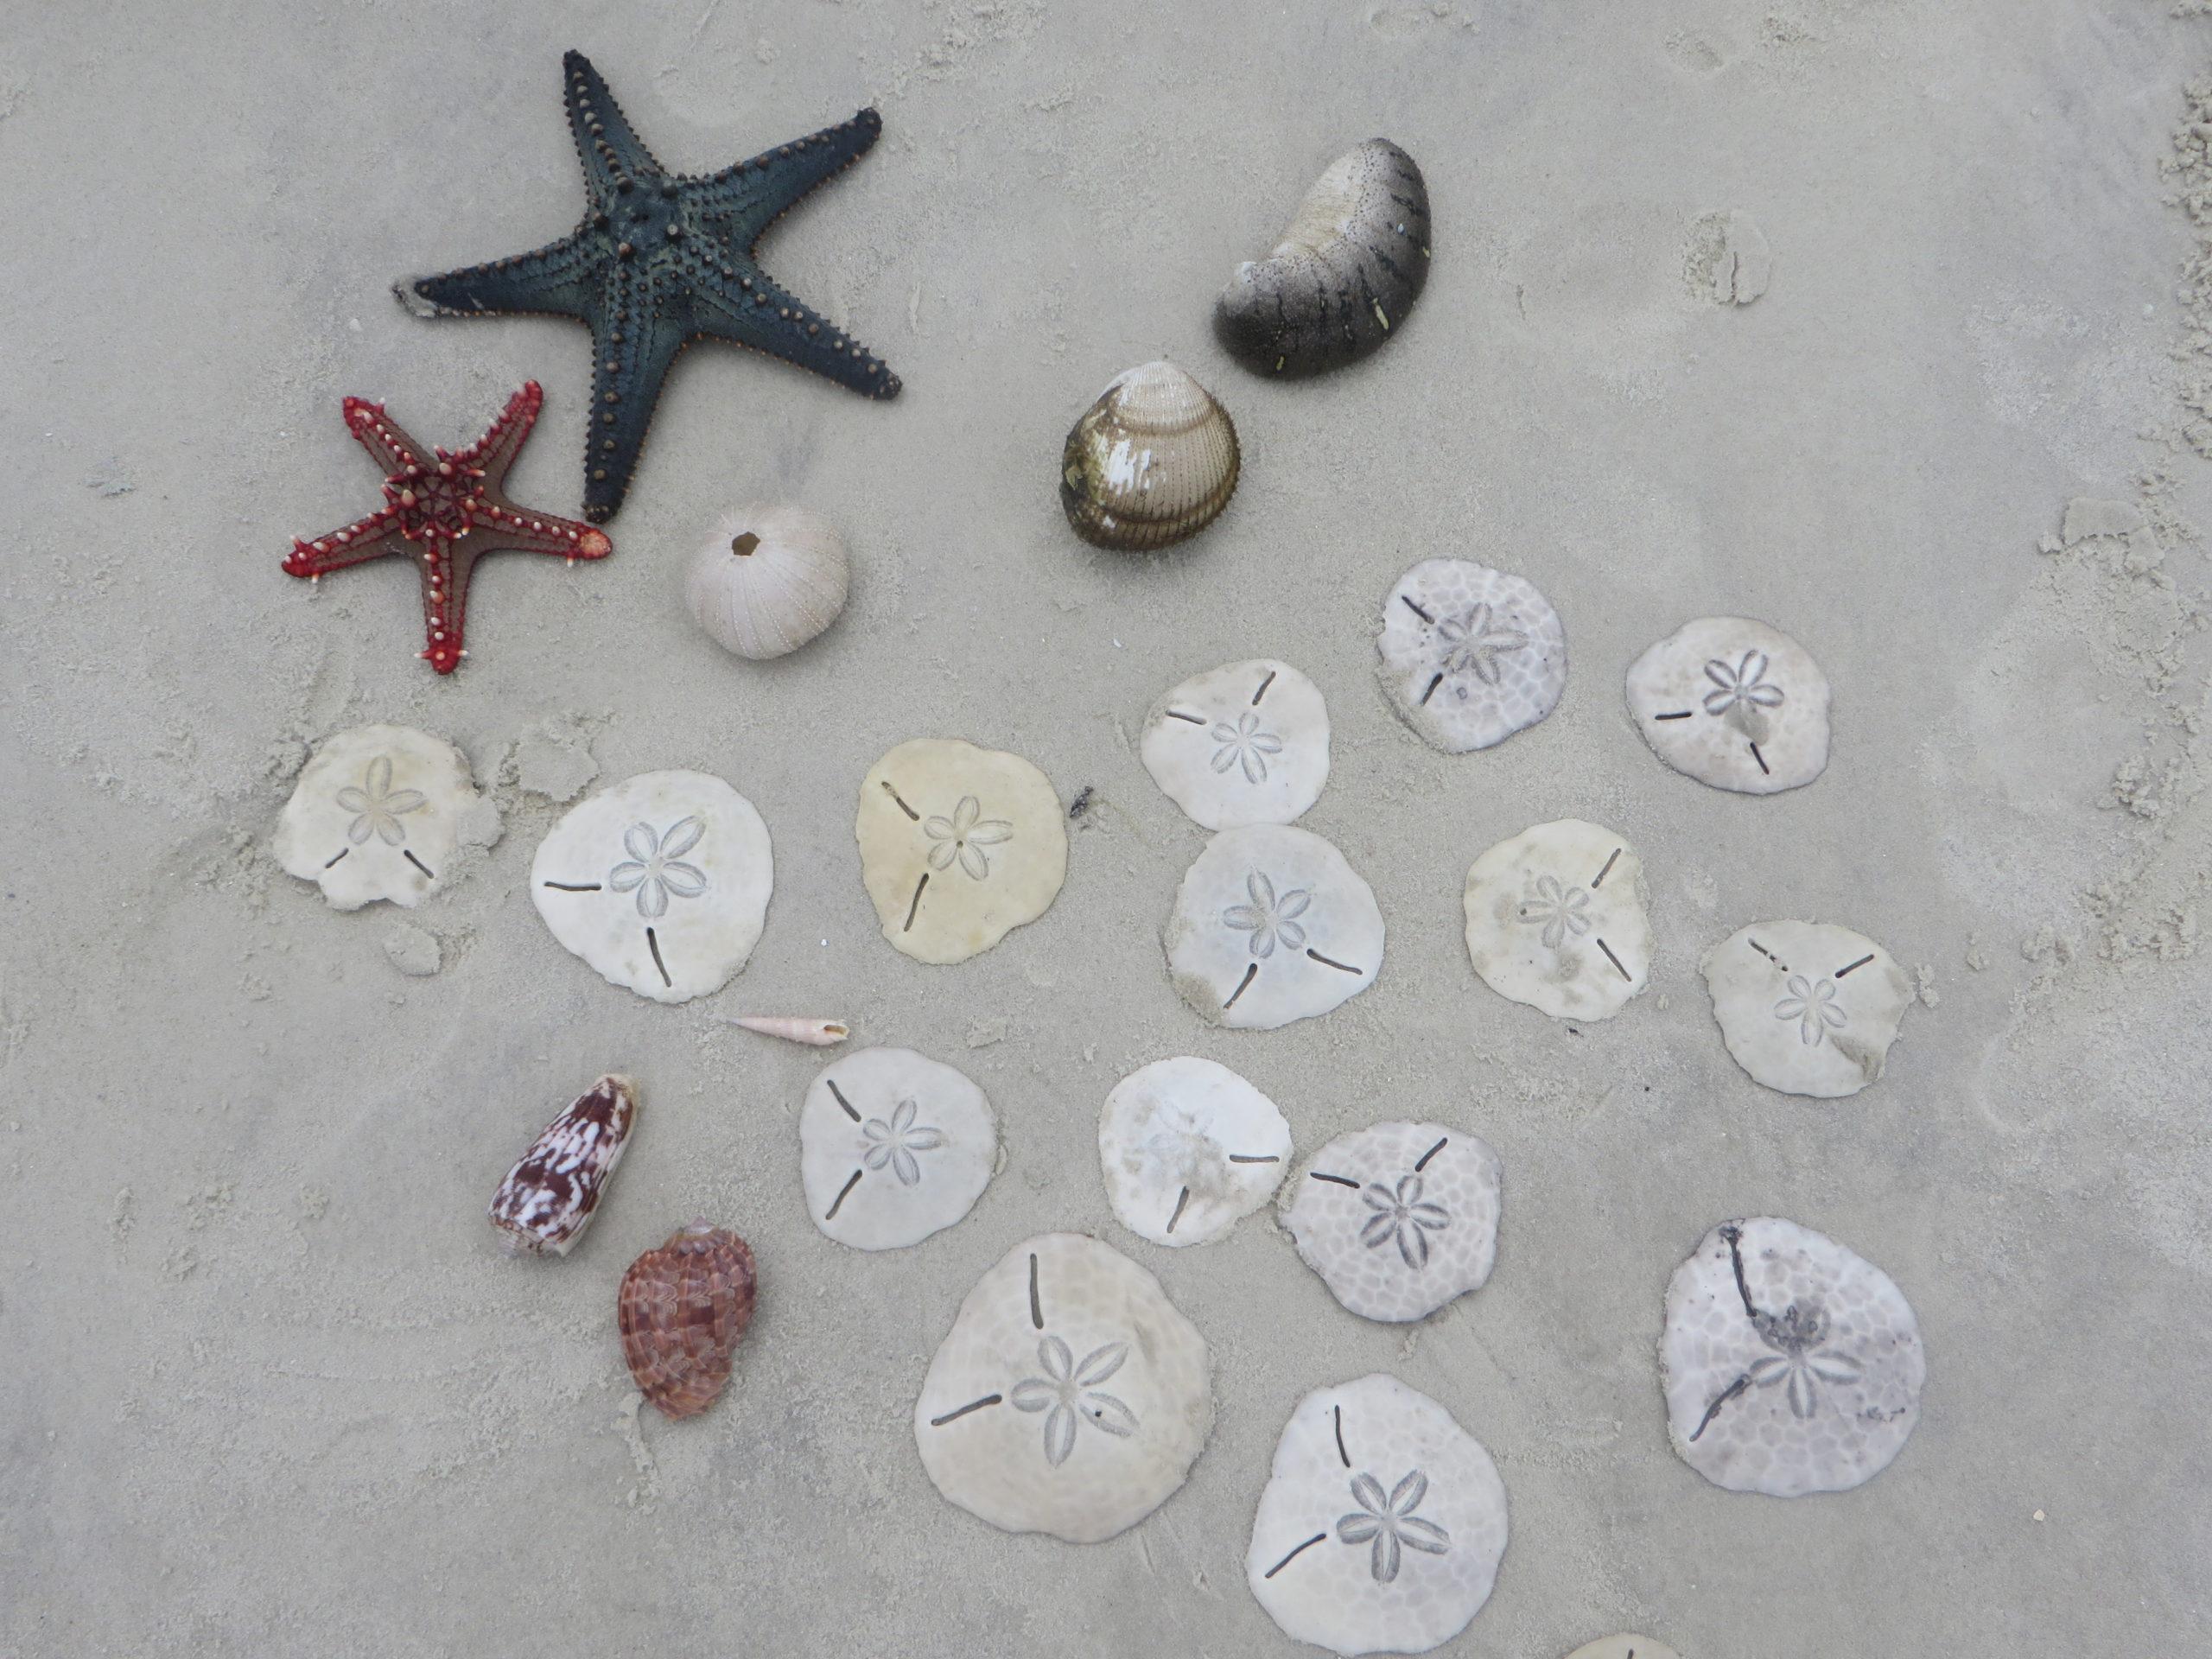 Funzi Island - Shells & starfish